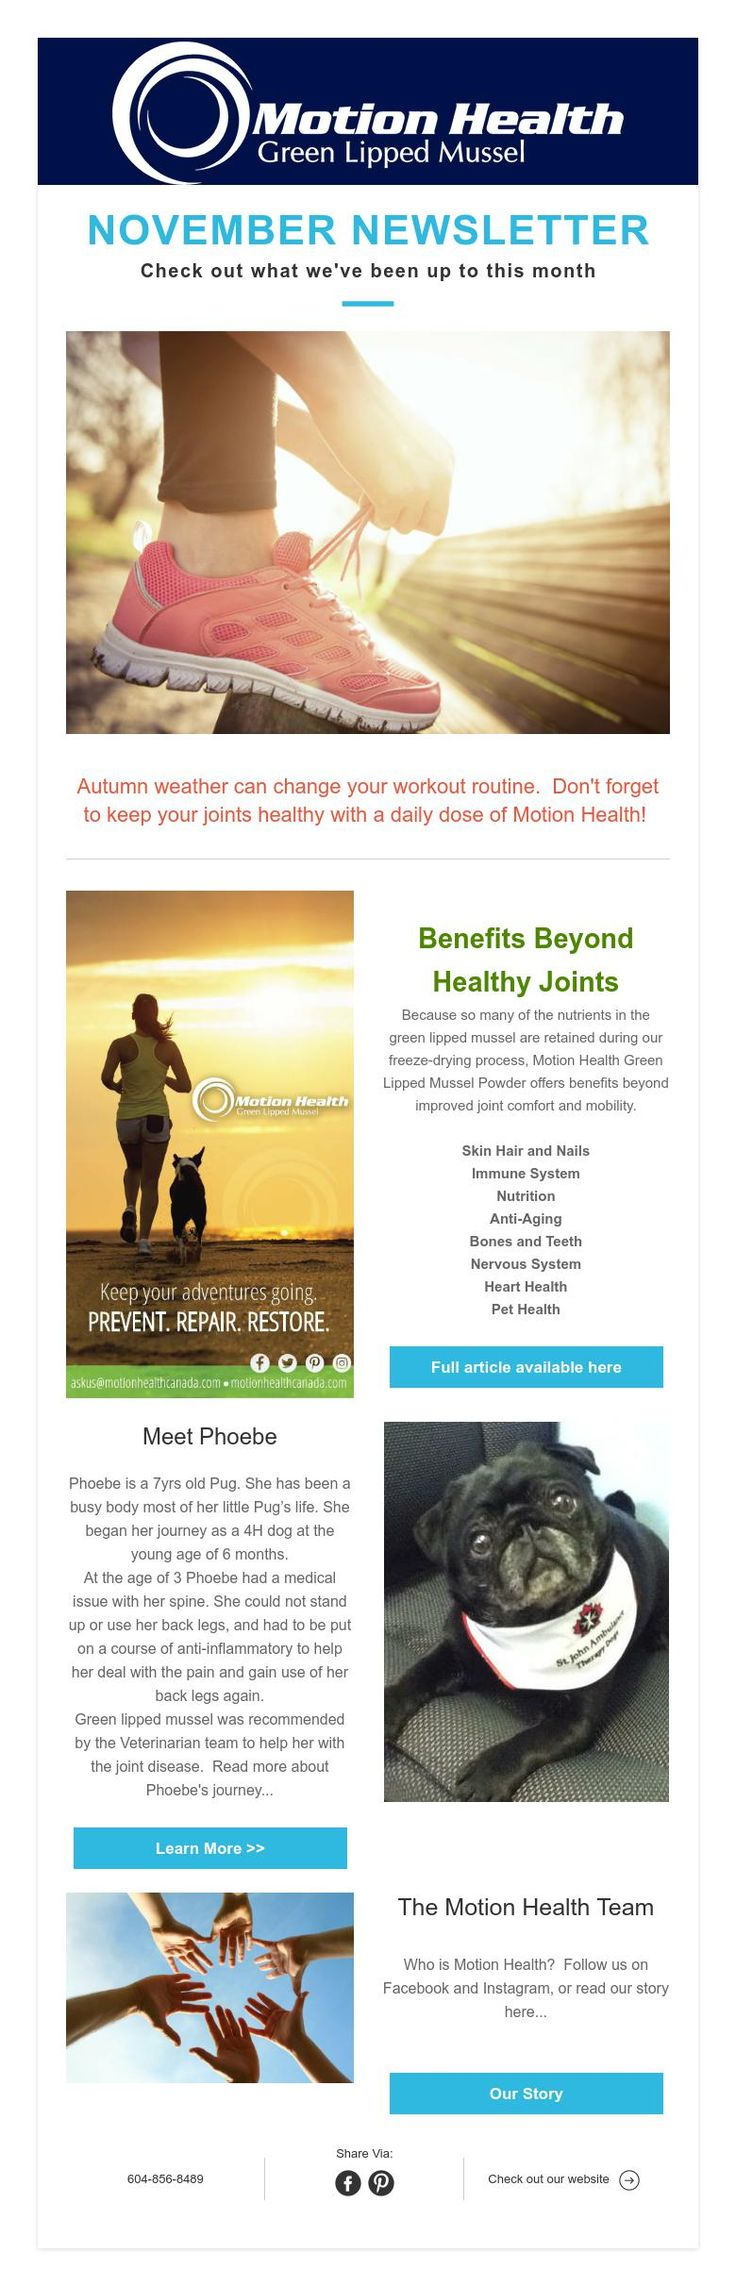 15 best biaya operasi kanker kelenjar getah bening terkini images on november newsletter test thecheapjerseys Images